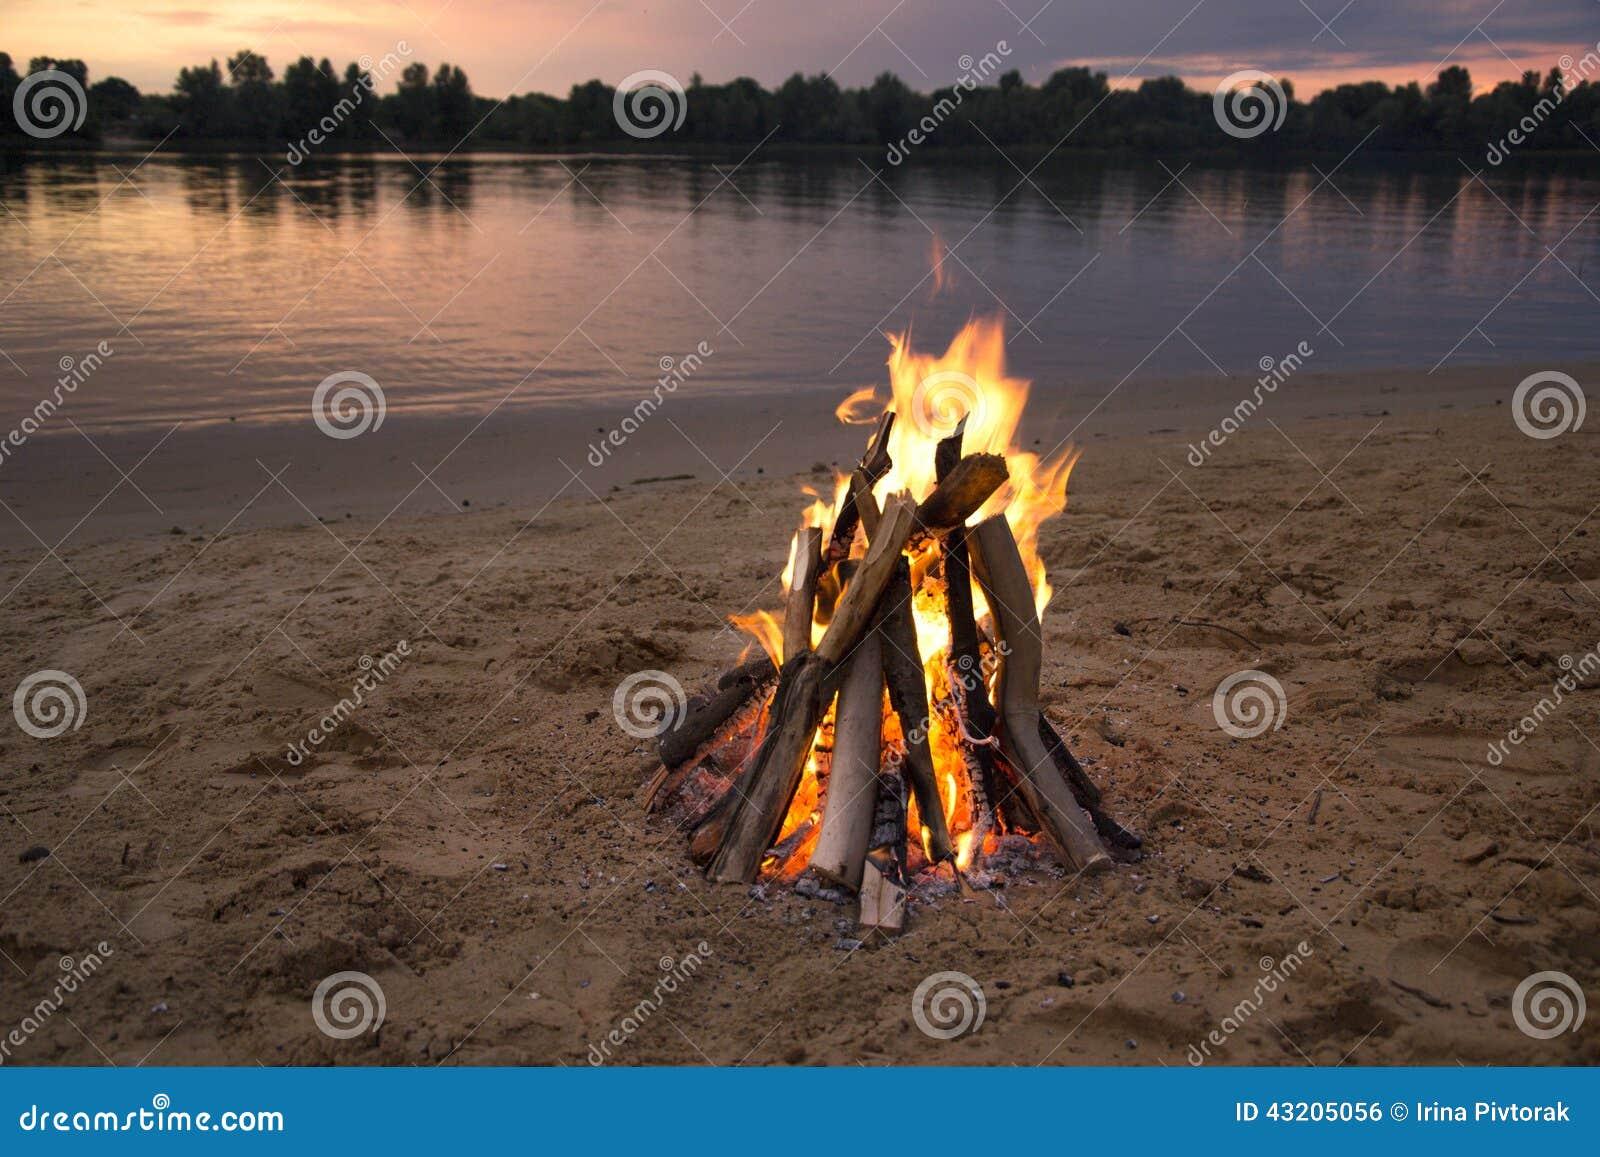 Download Brasa På Banken Av Floden På Solnedgången Arkivfoto - Bild av natt, horisont: 43205056